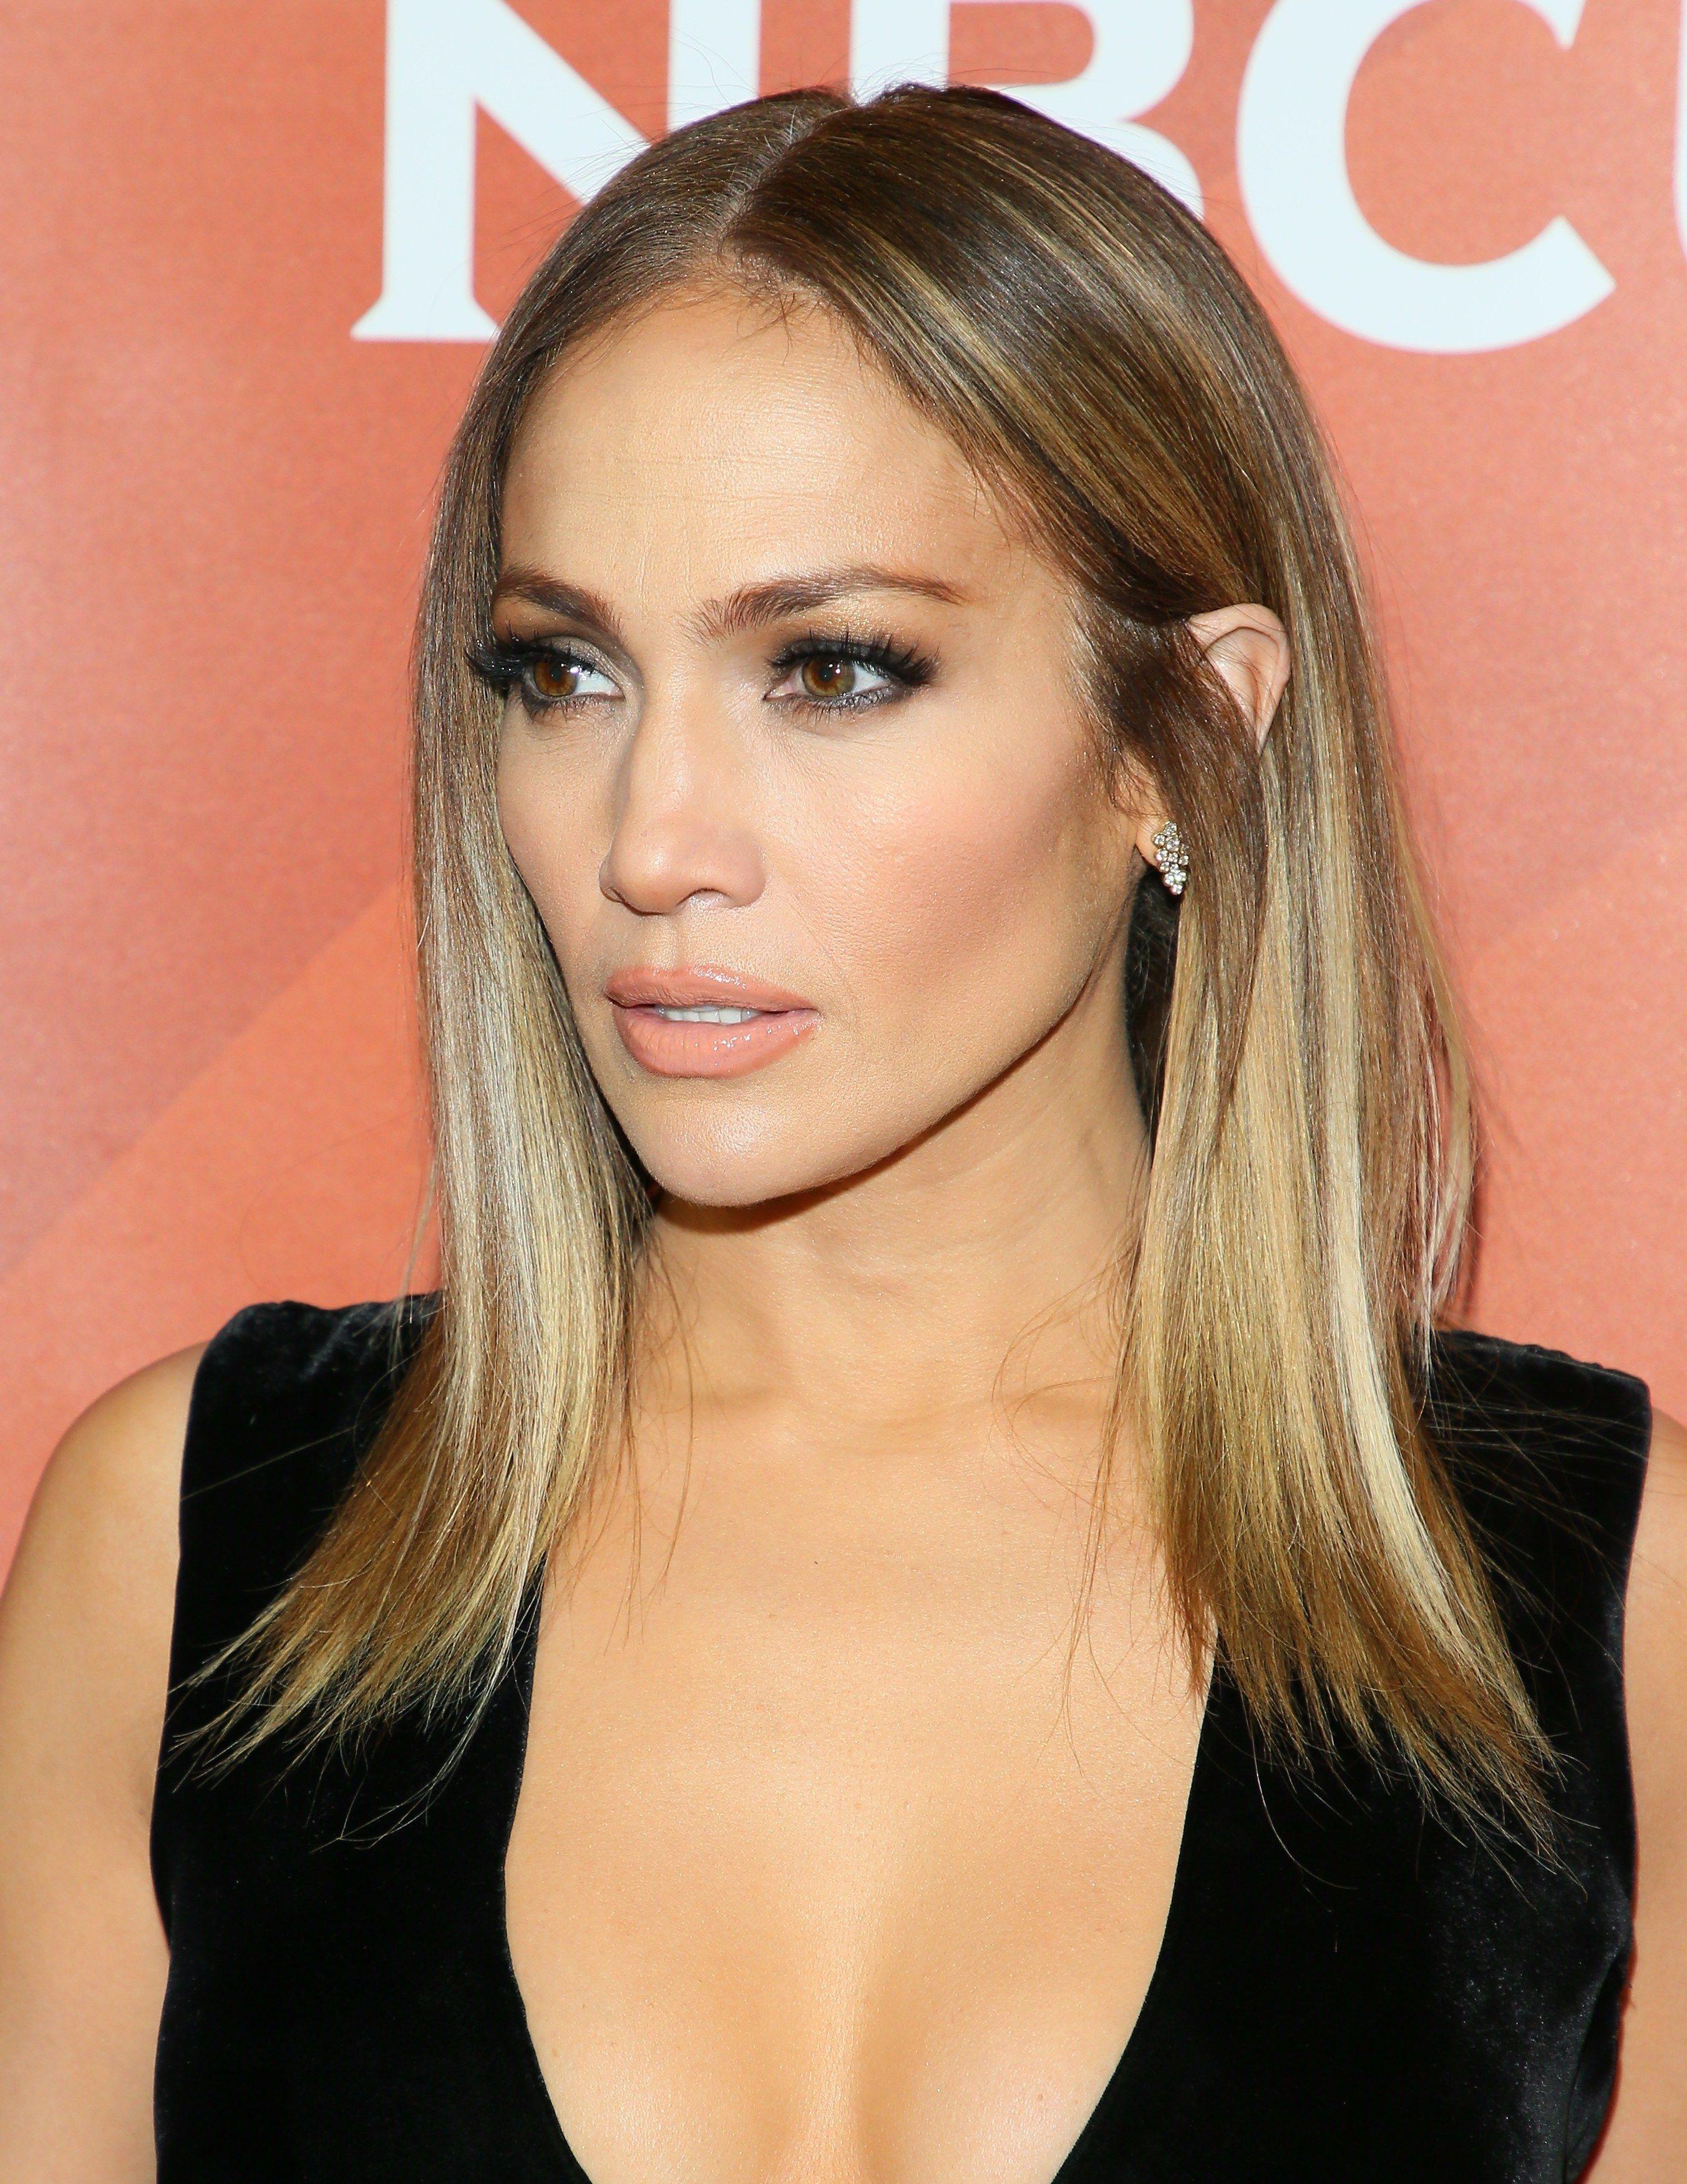 Whoa Jennifer Lopez Just Cut Her Hair Into a Shoulder Length Lob